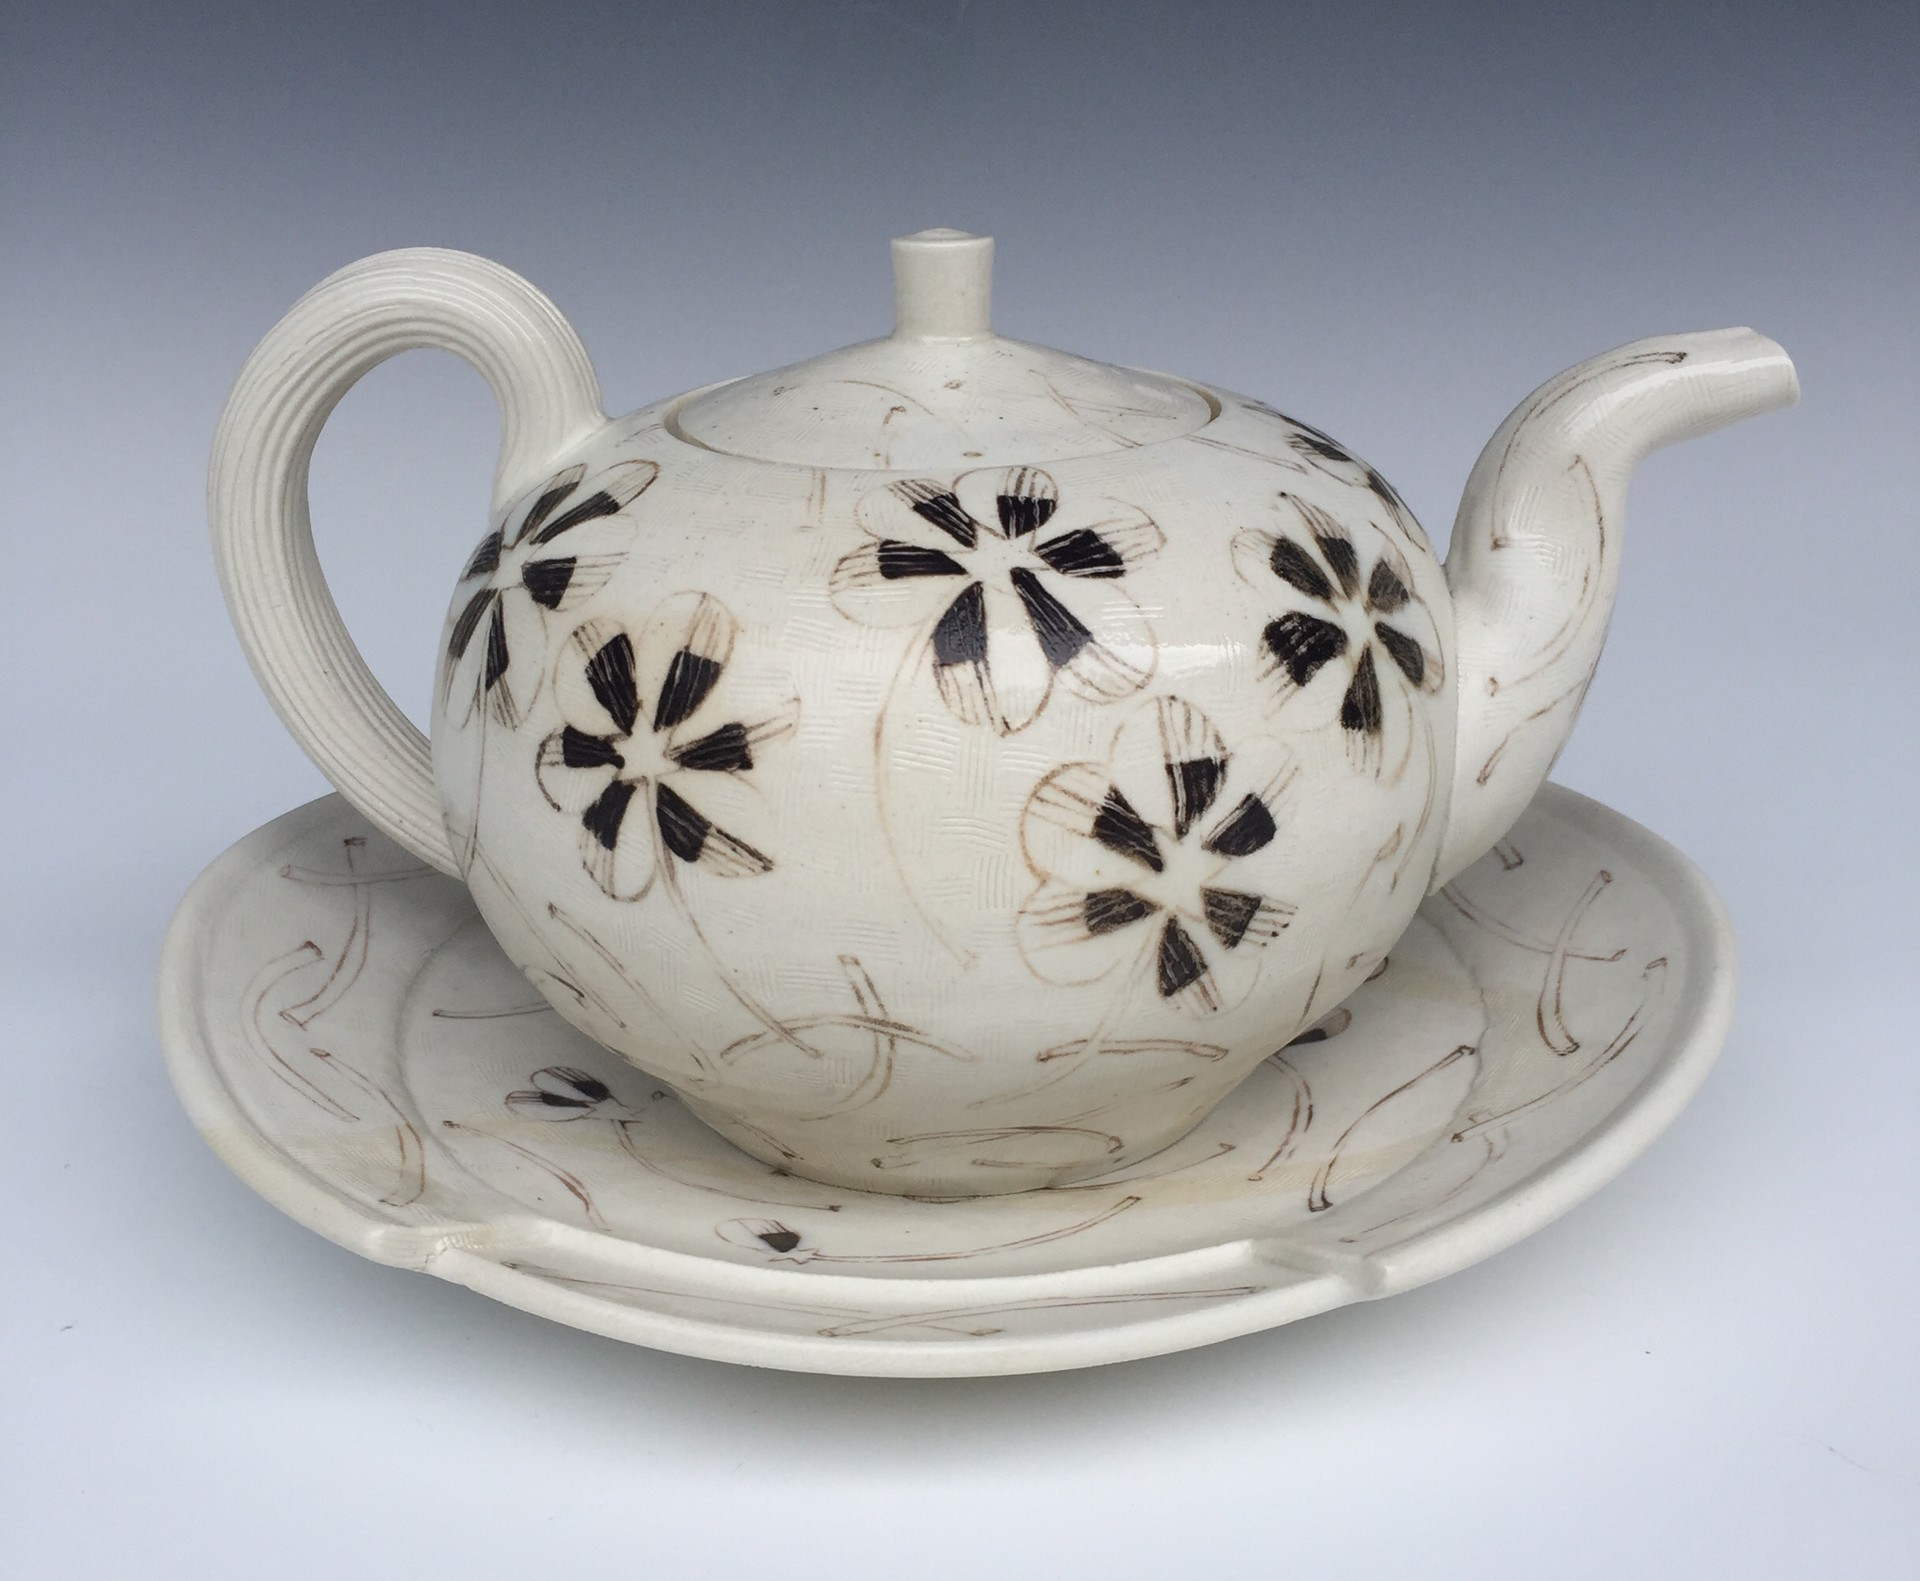 Teapot w/Oval Plate & Handpainted Motifs by Linda Sikora